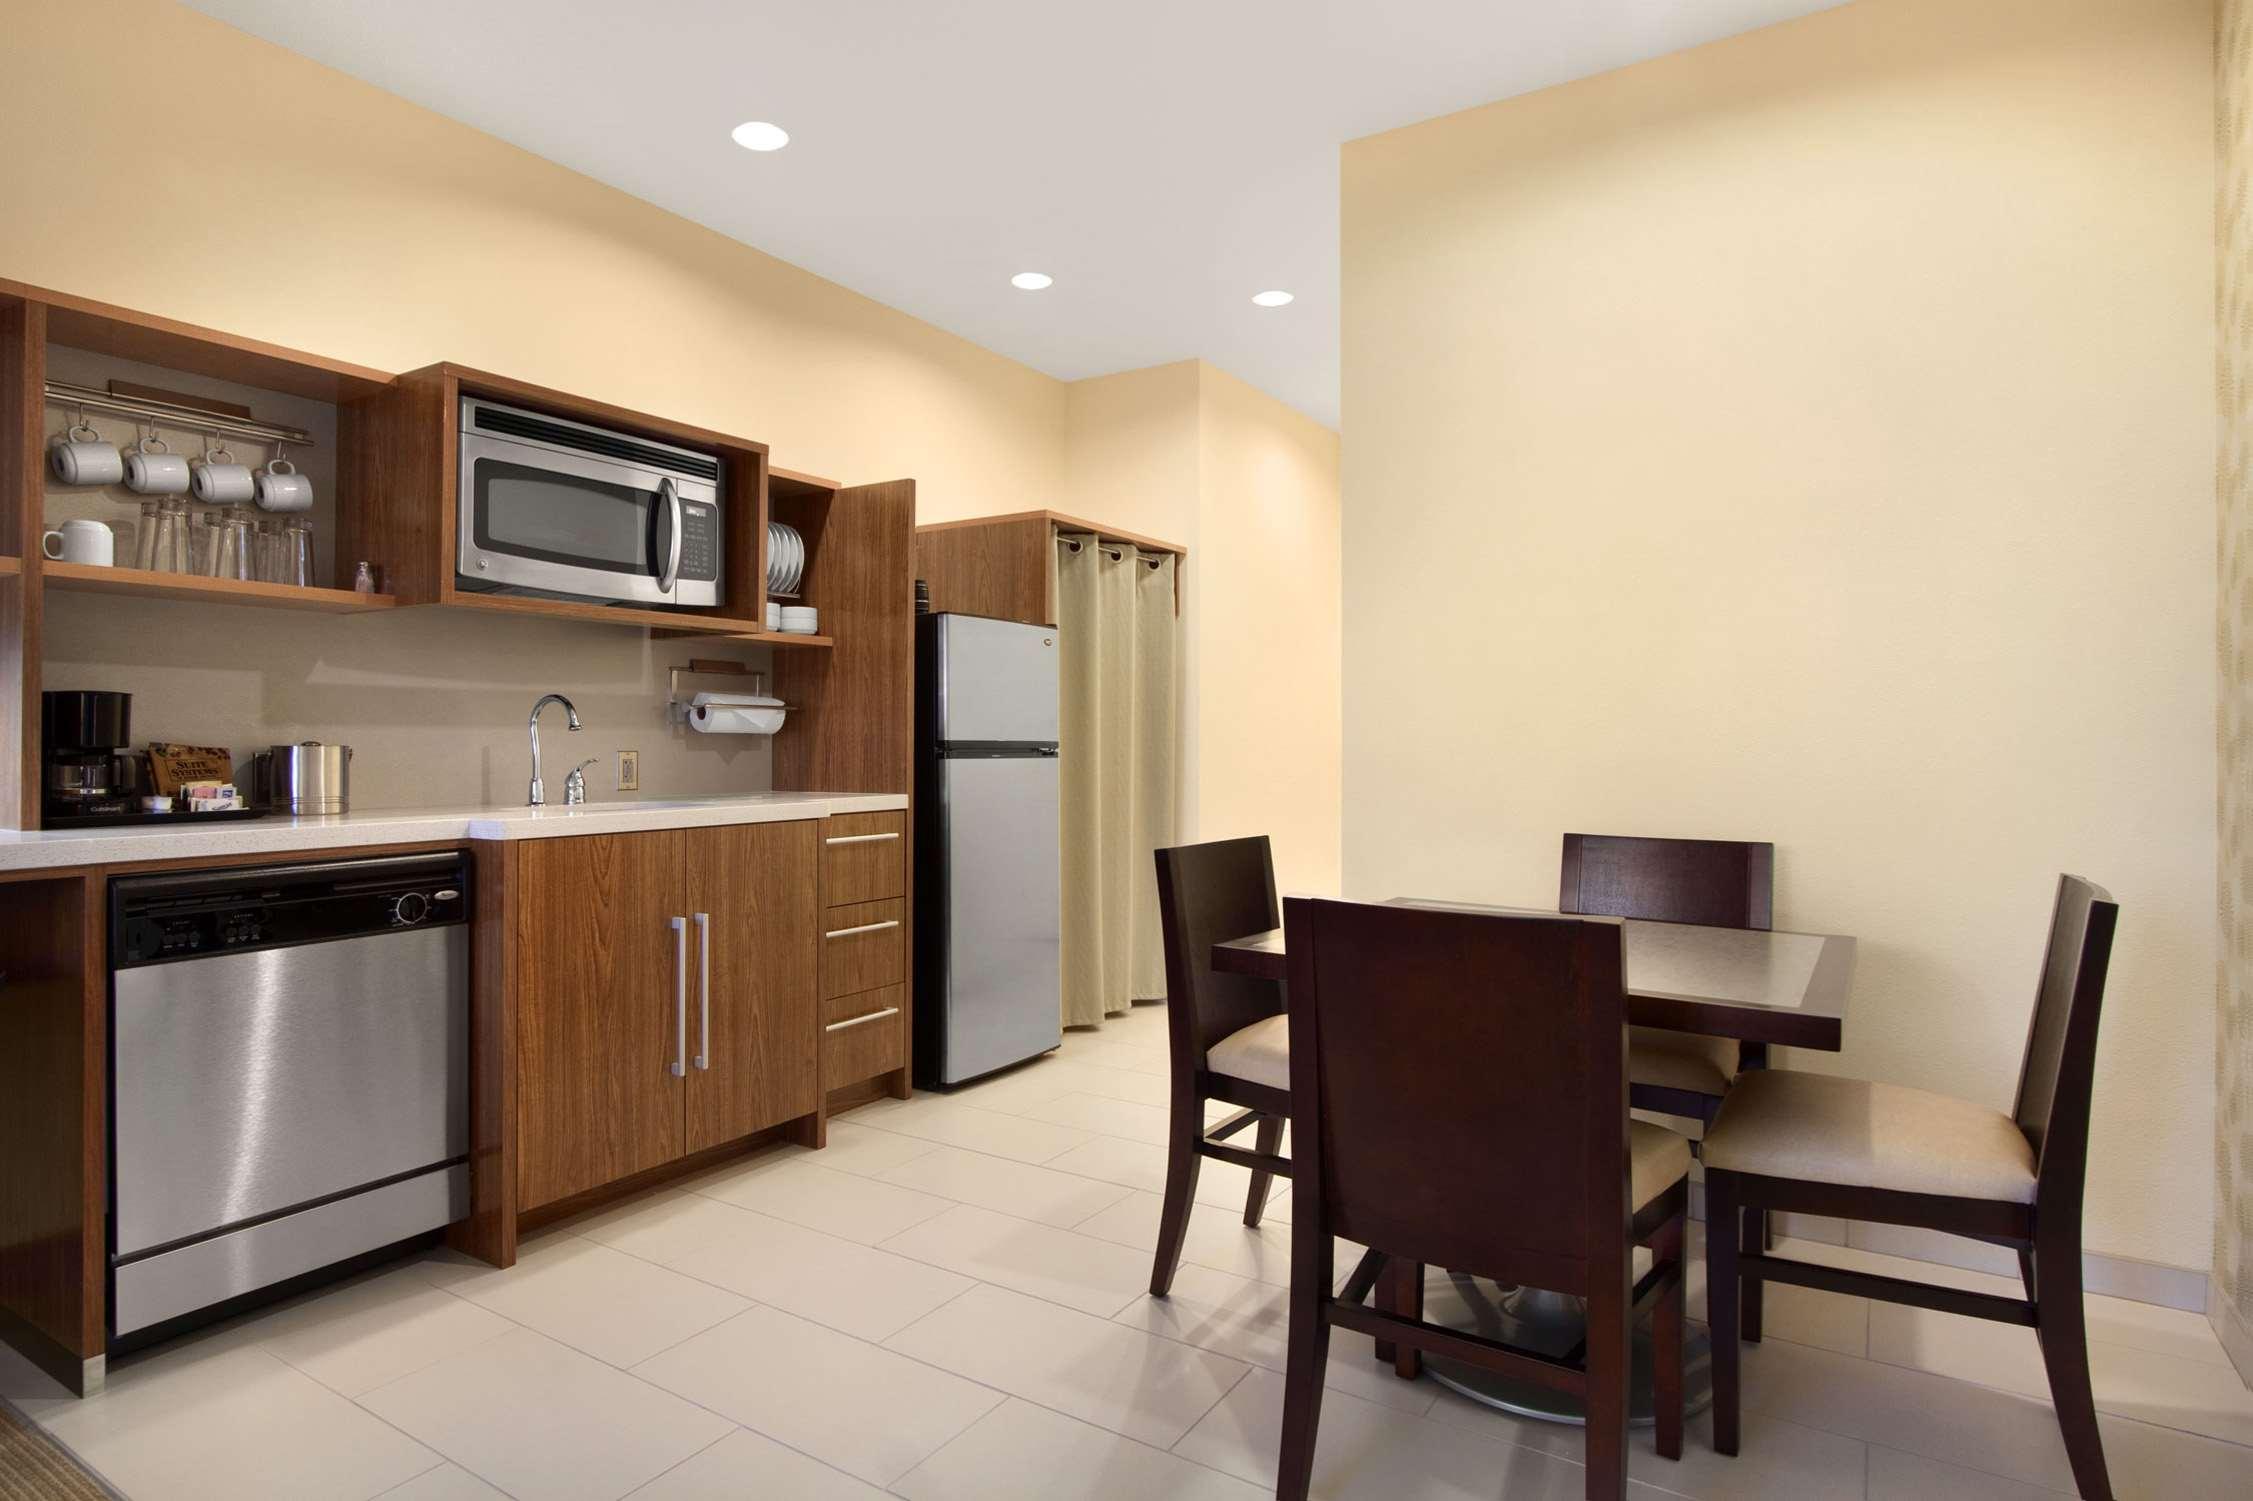 Home2 Suites by Hilton Fayetteville, NC image 8